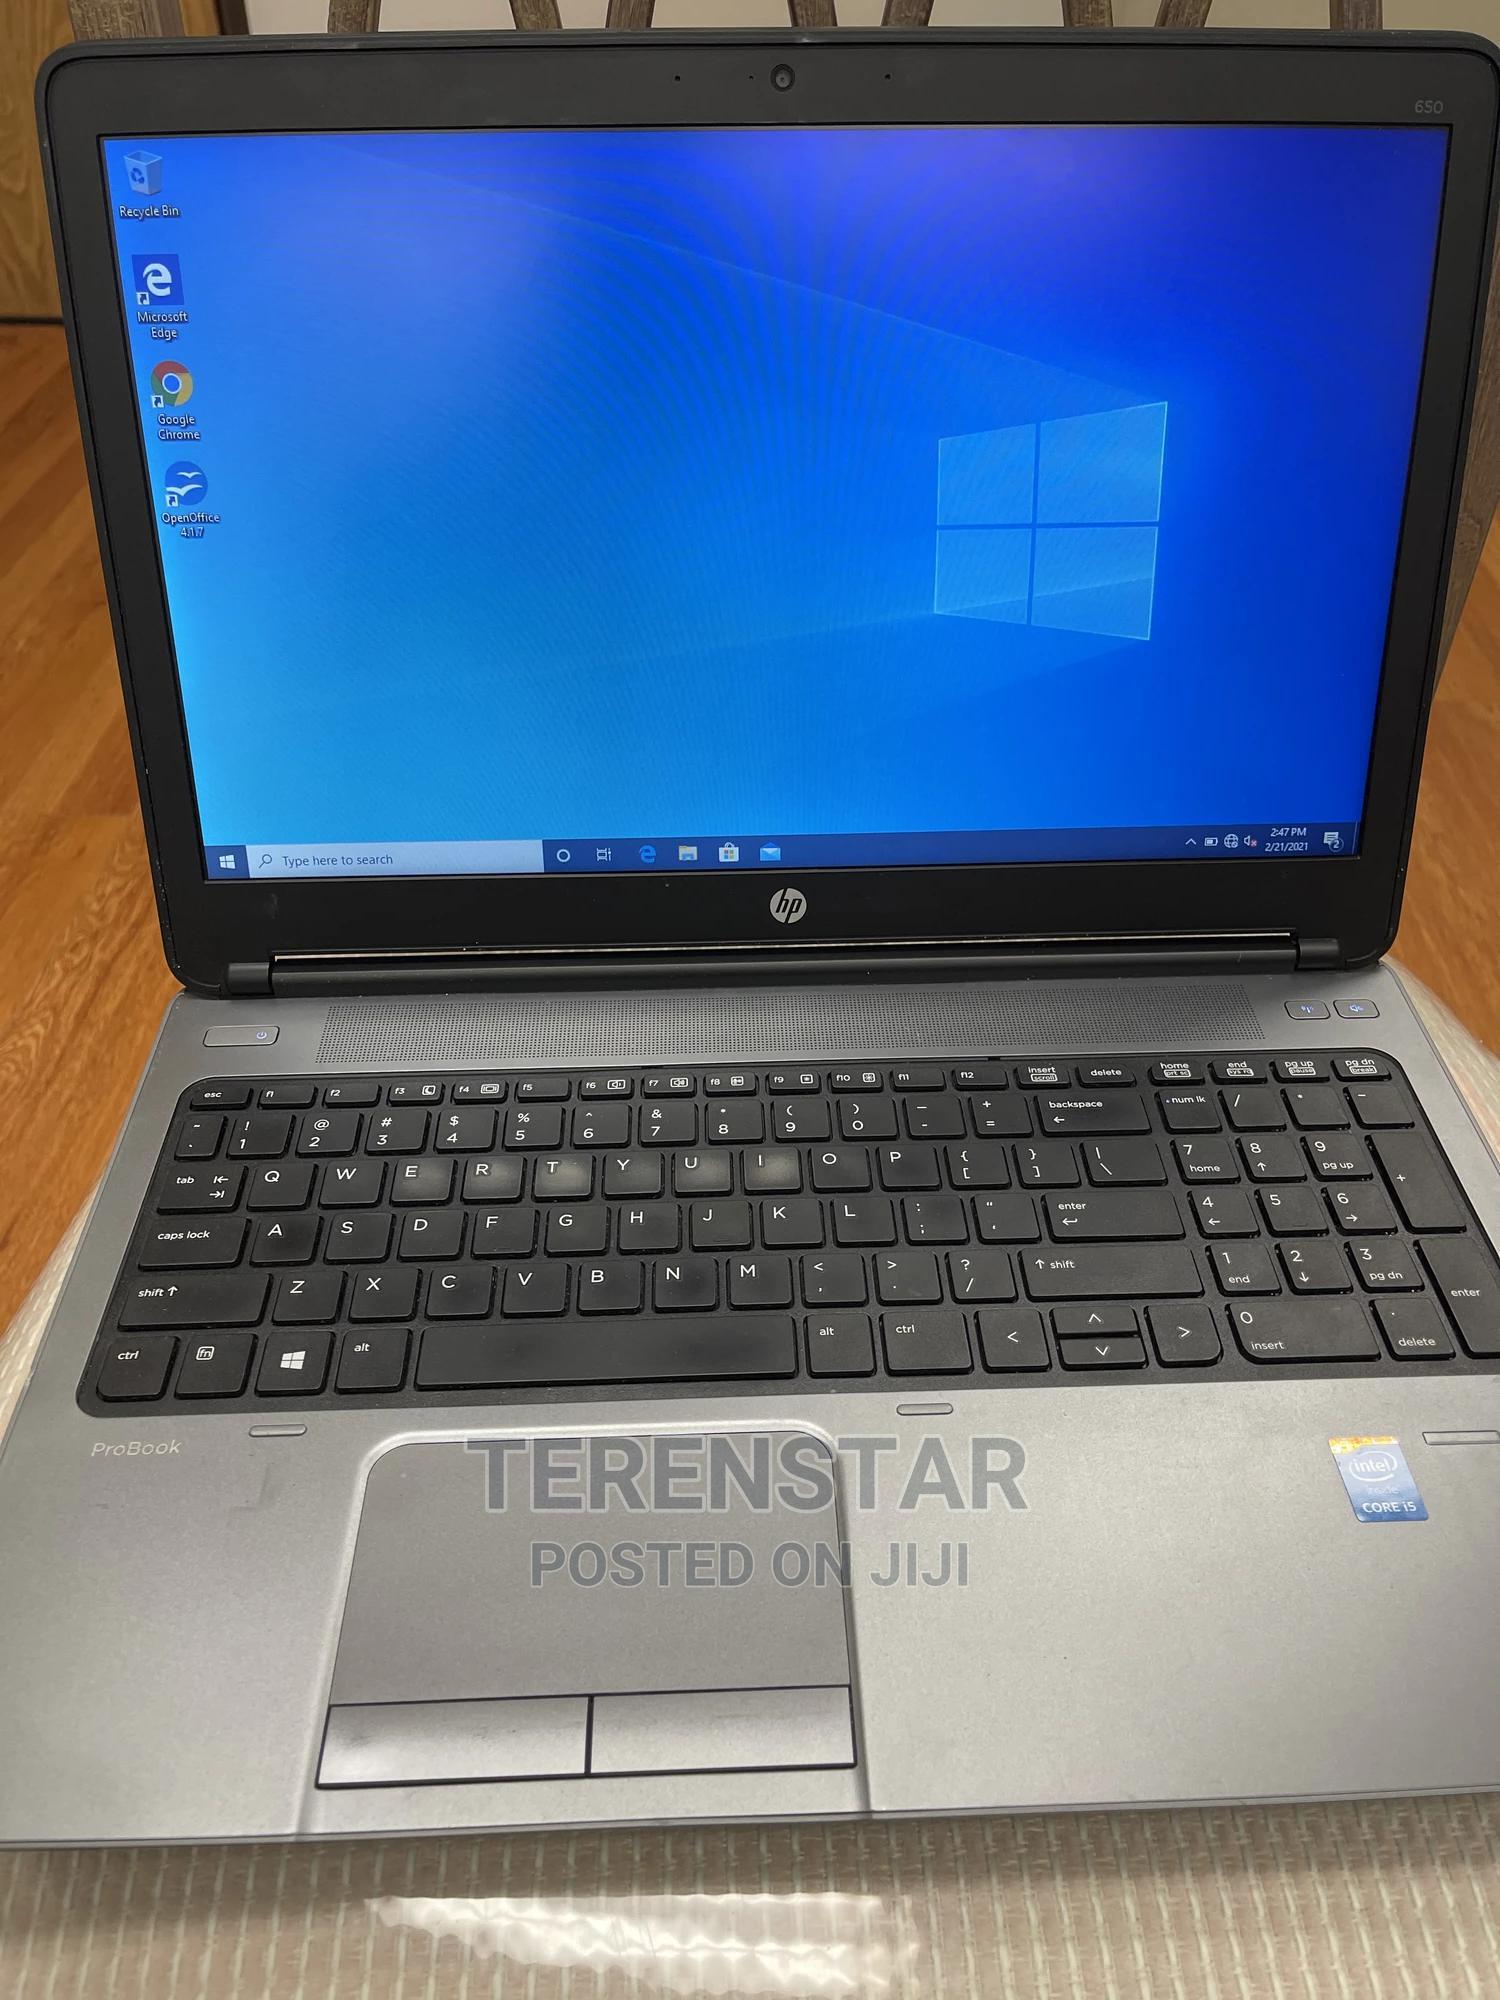 Laptop HP 650 G1 8GB Intel Core I5 HDD 500GB | Laptops & Computers for sale in Enugu, Enugu State, Nigeria